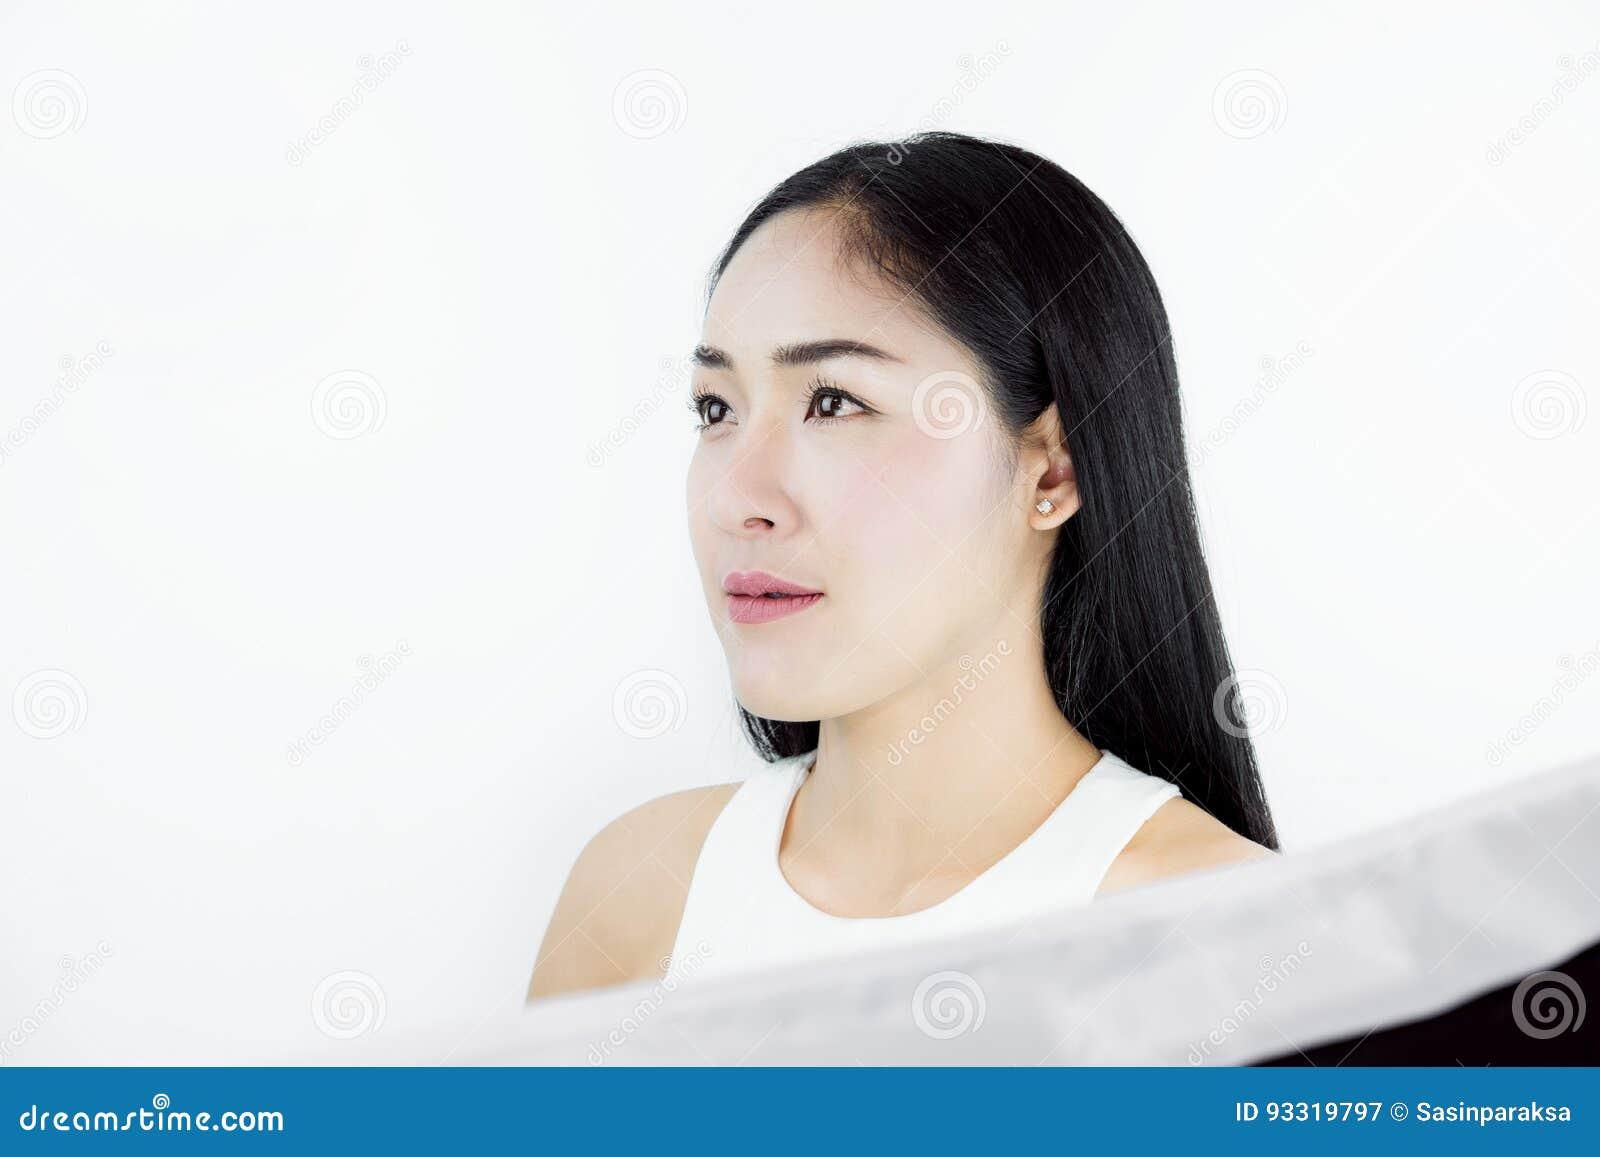 Facial recognition software for vista